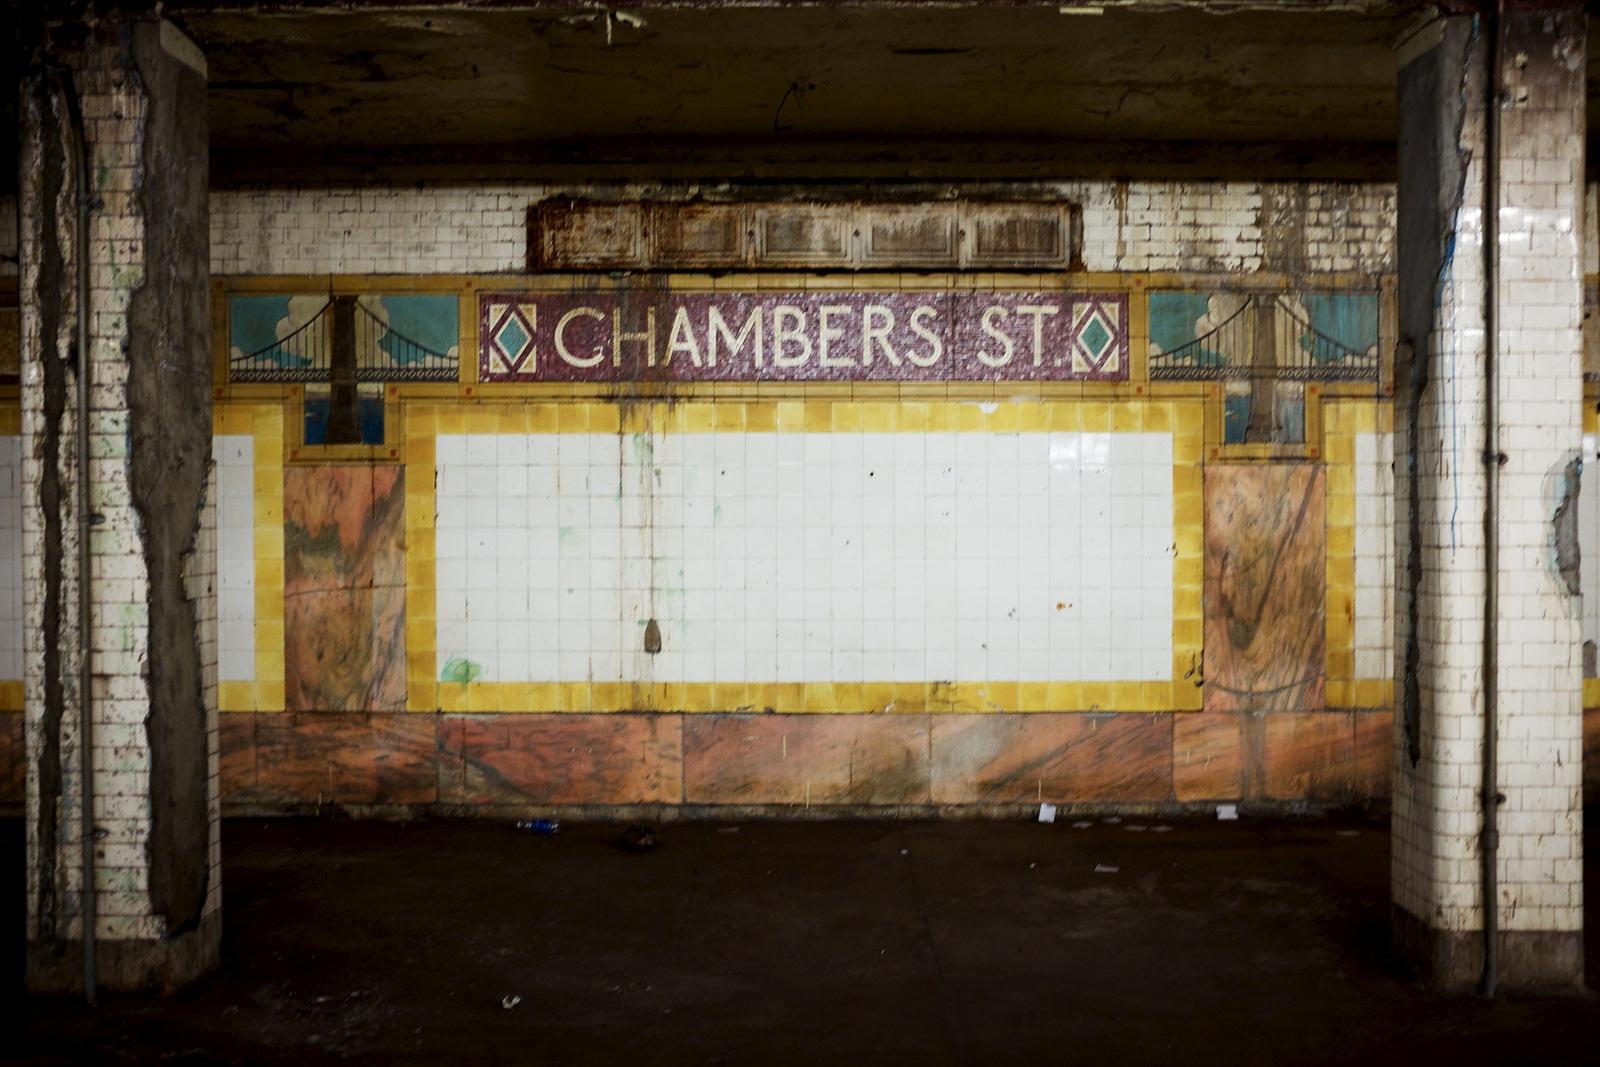 Chambers Street Subway Station Tiling